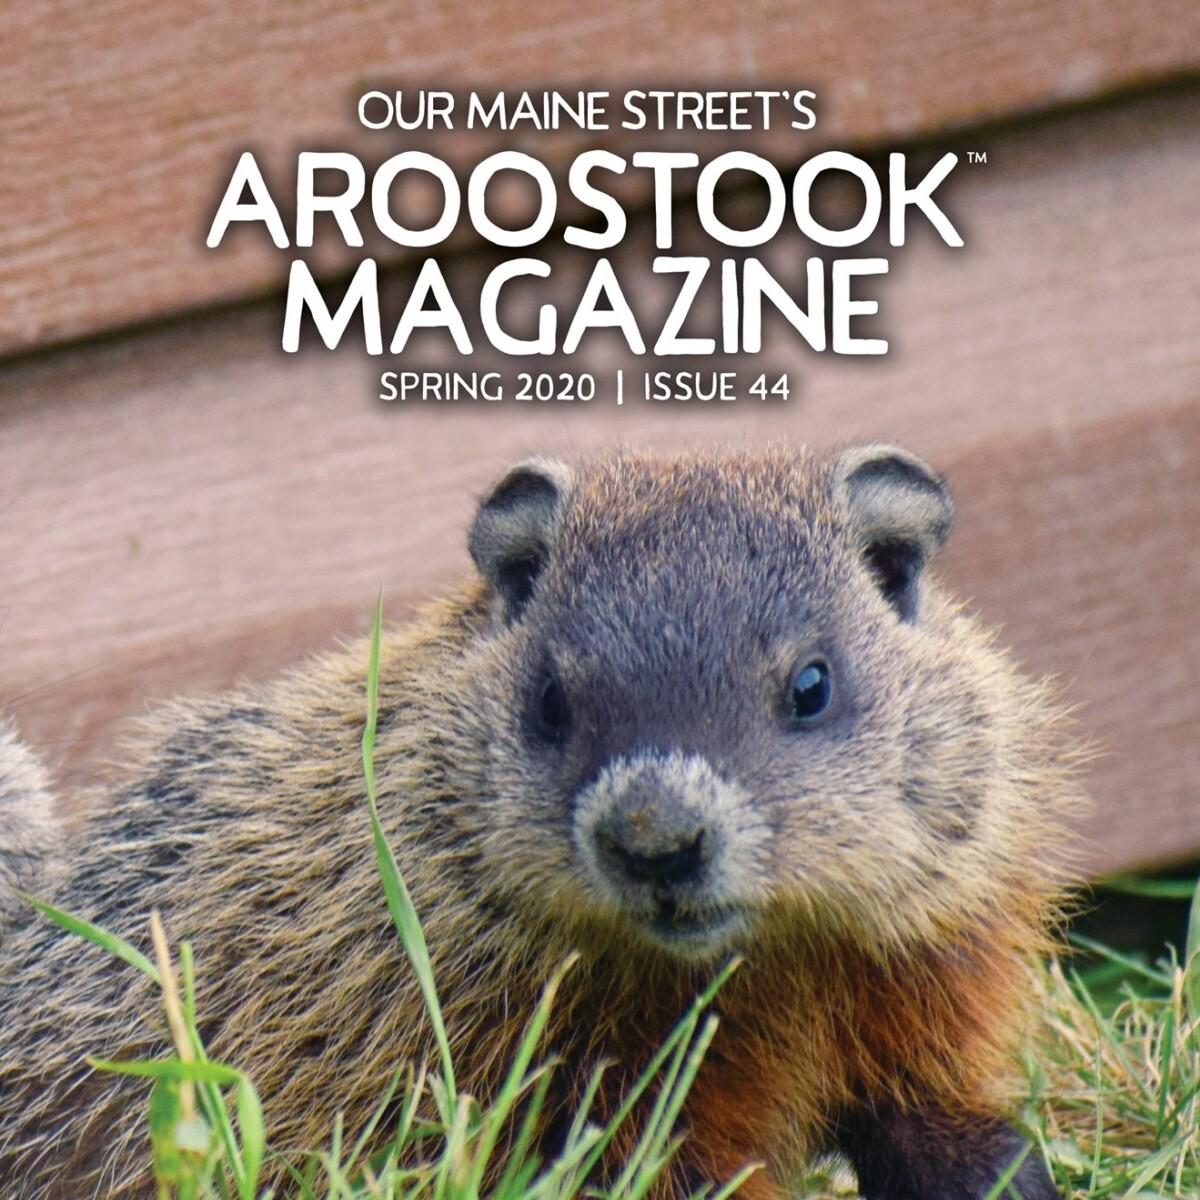 Our Maine Street's Aroostook Magazine Spring 2020 Cover (photo by Vonda Lavway)